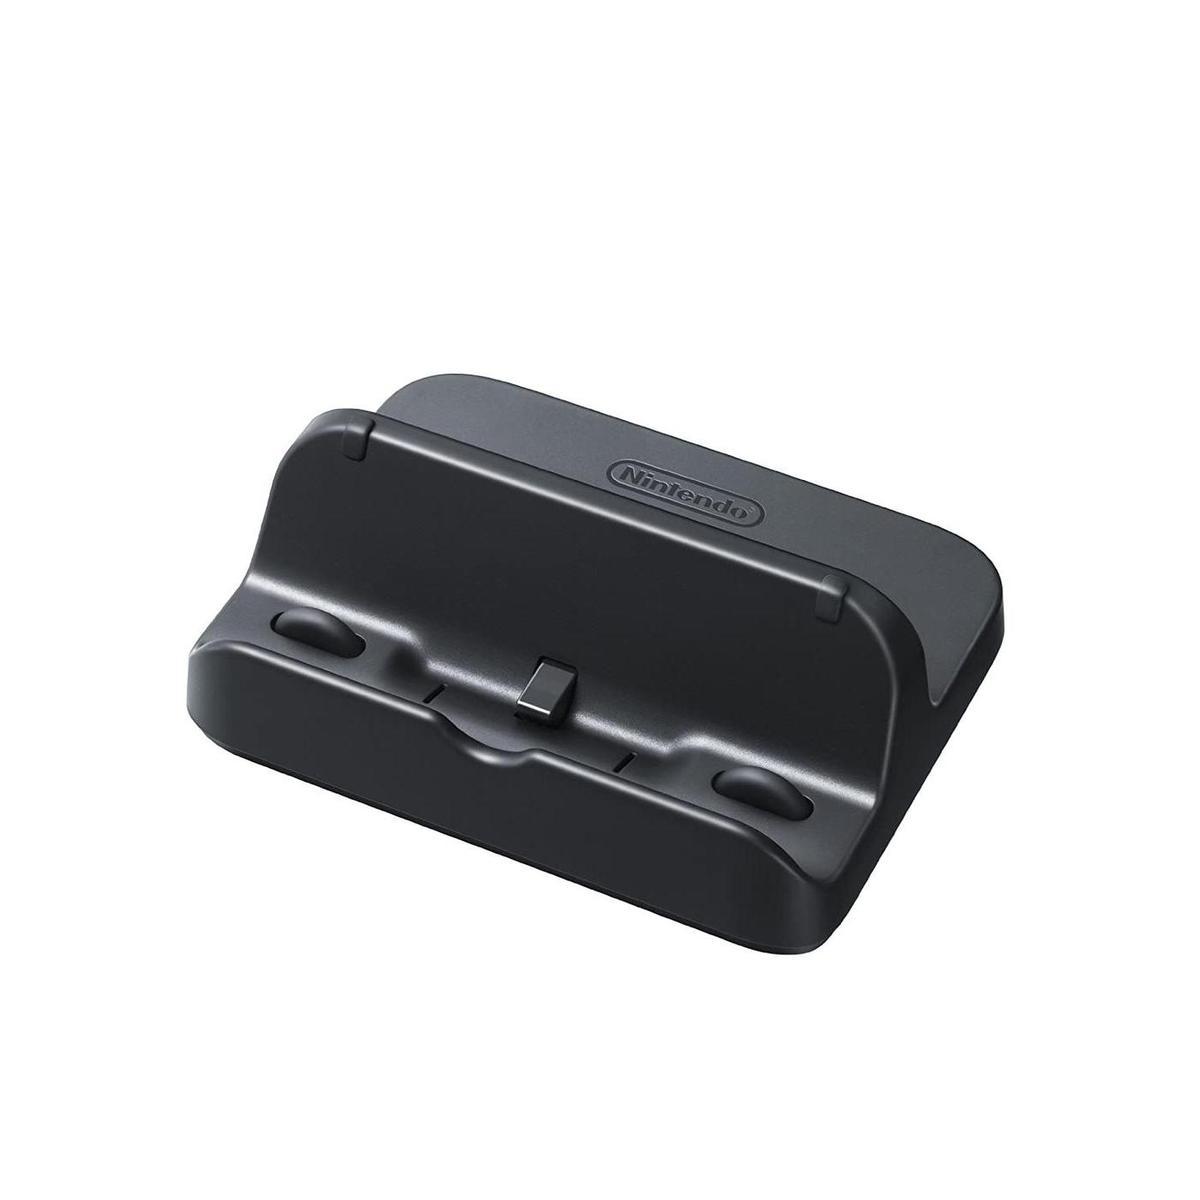 Wii U GamePad Stand/Cradle Set - Sort